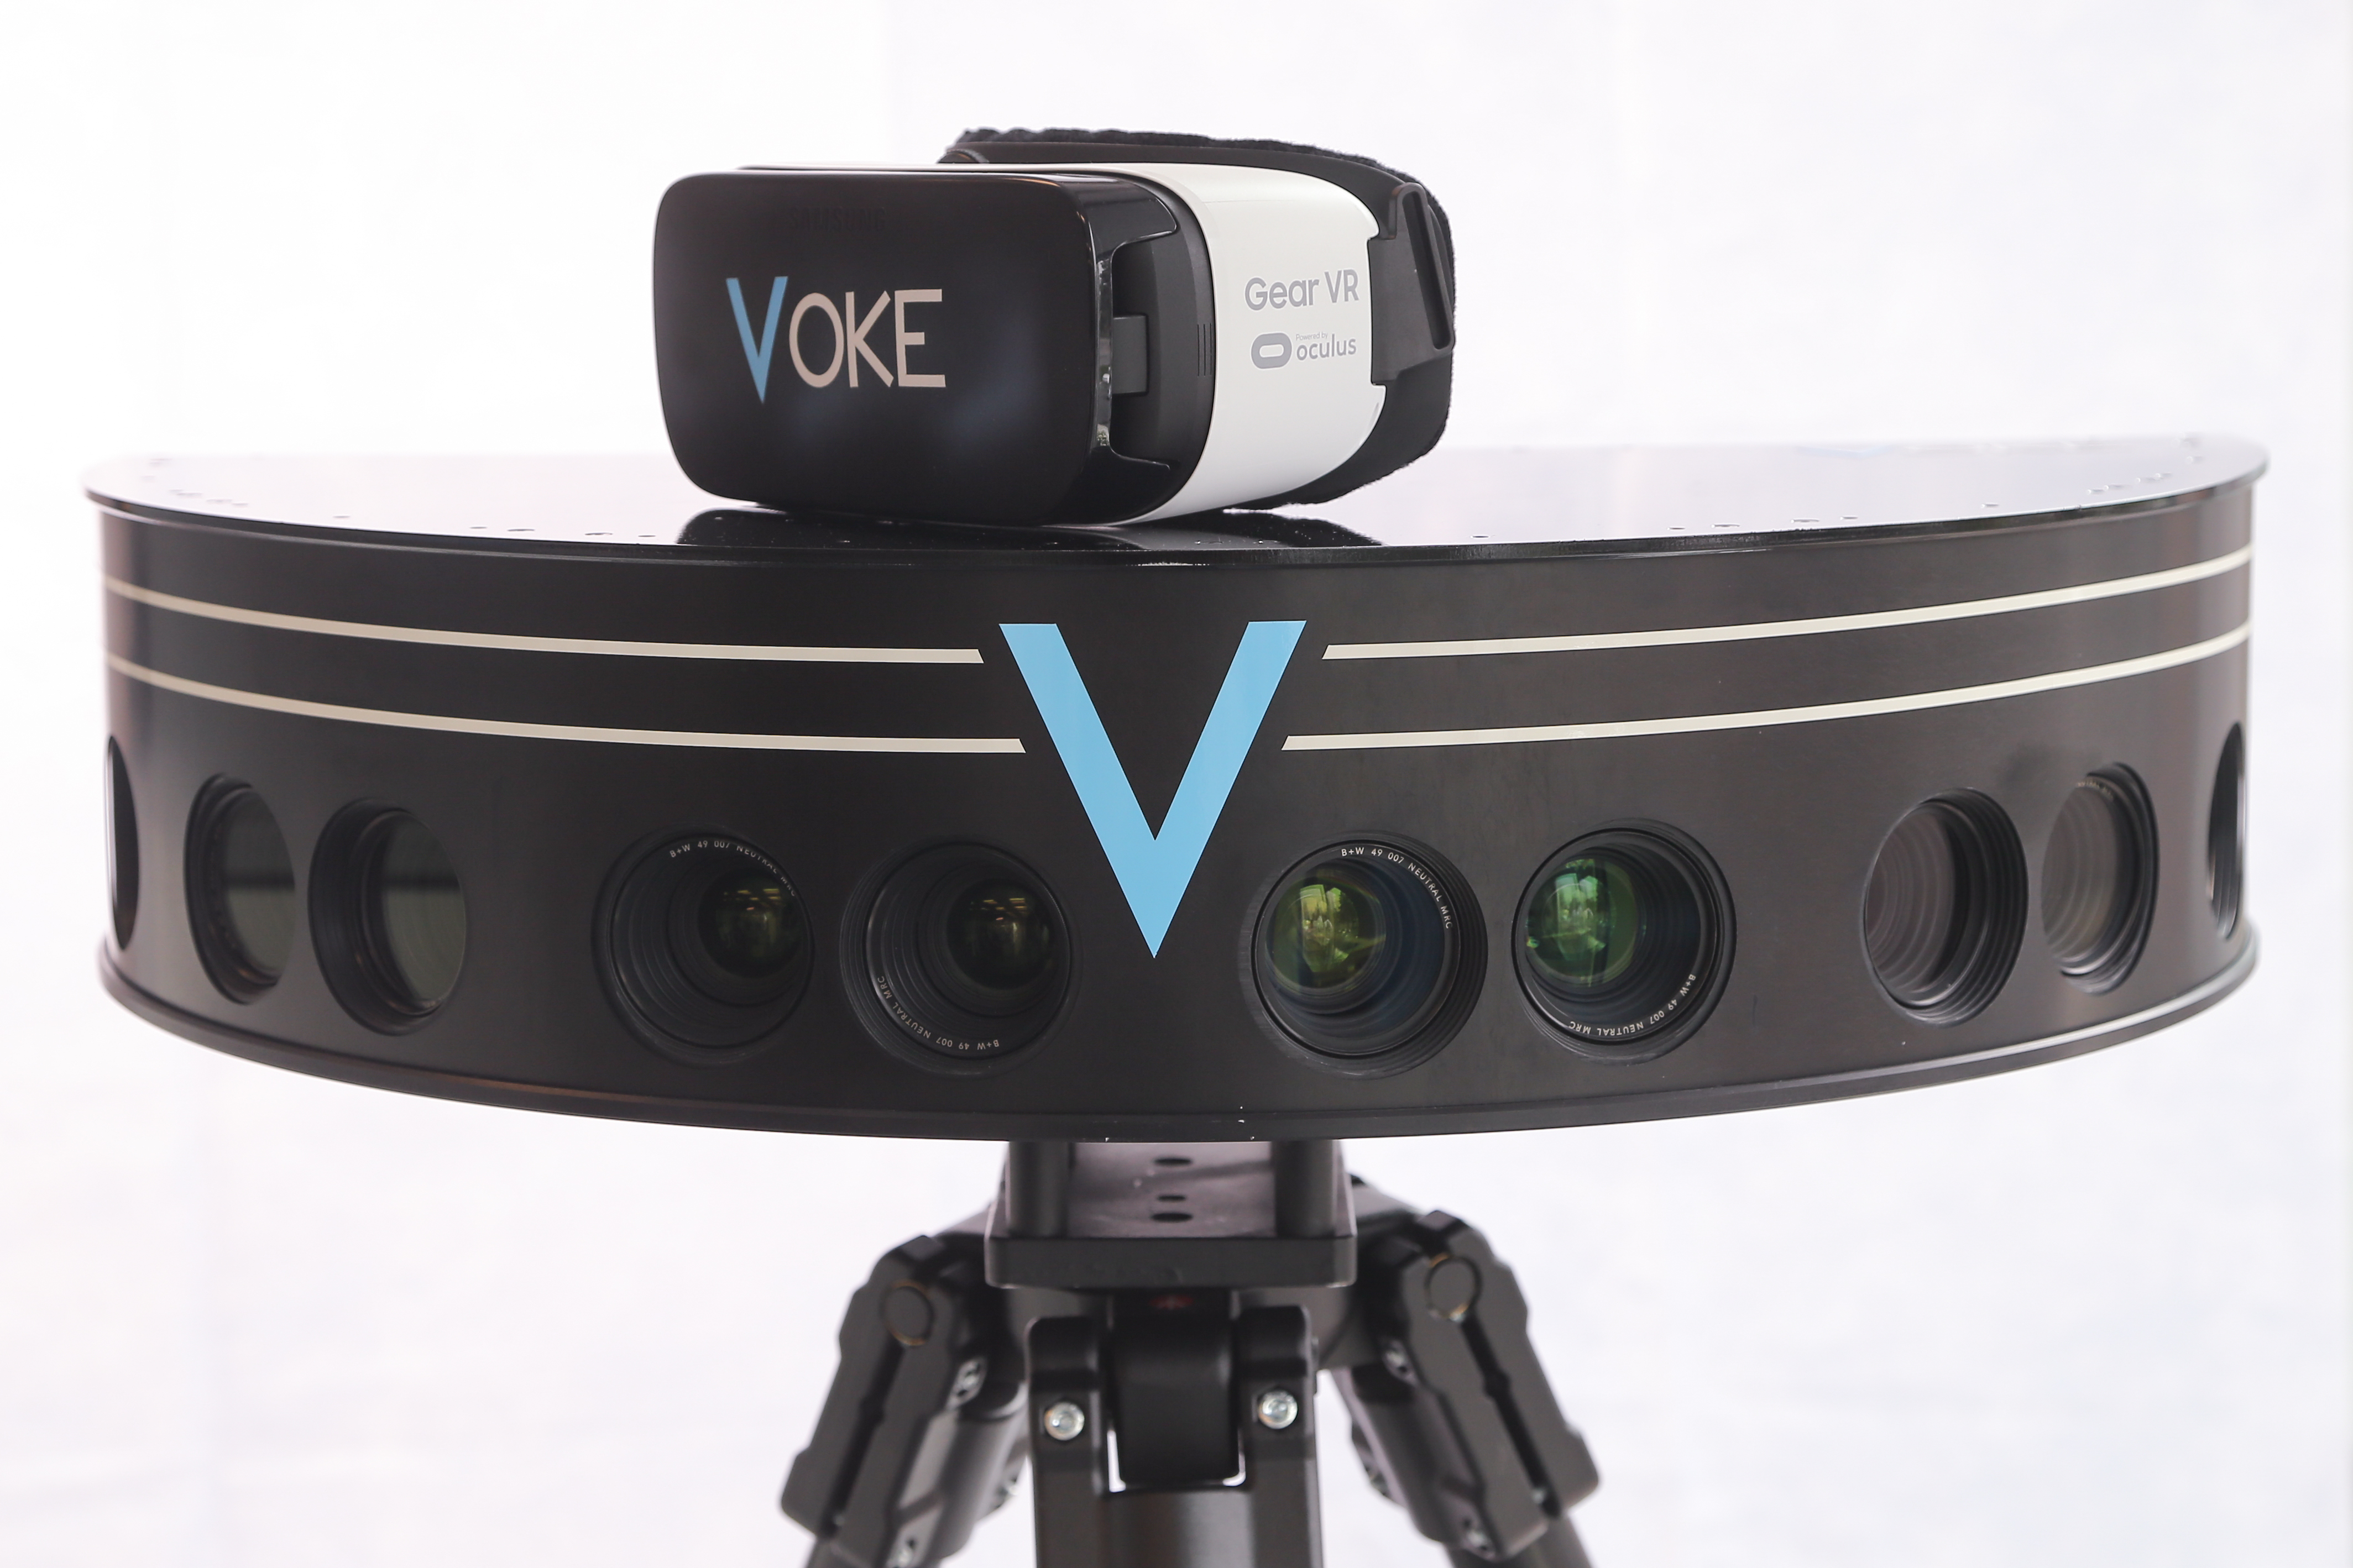 Voke VR-08